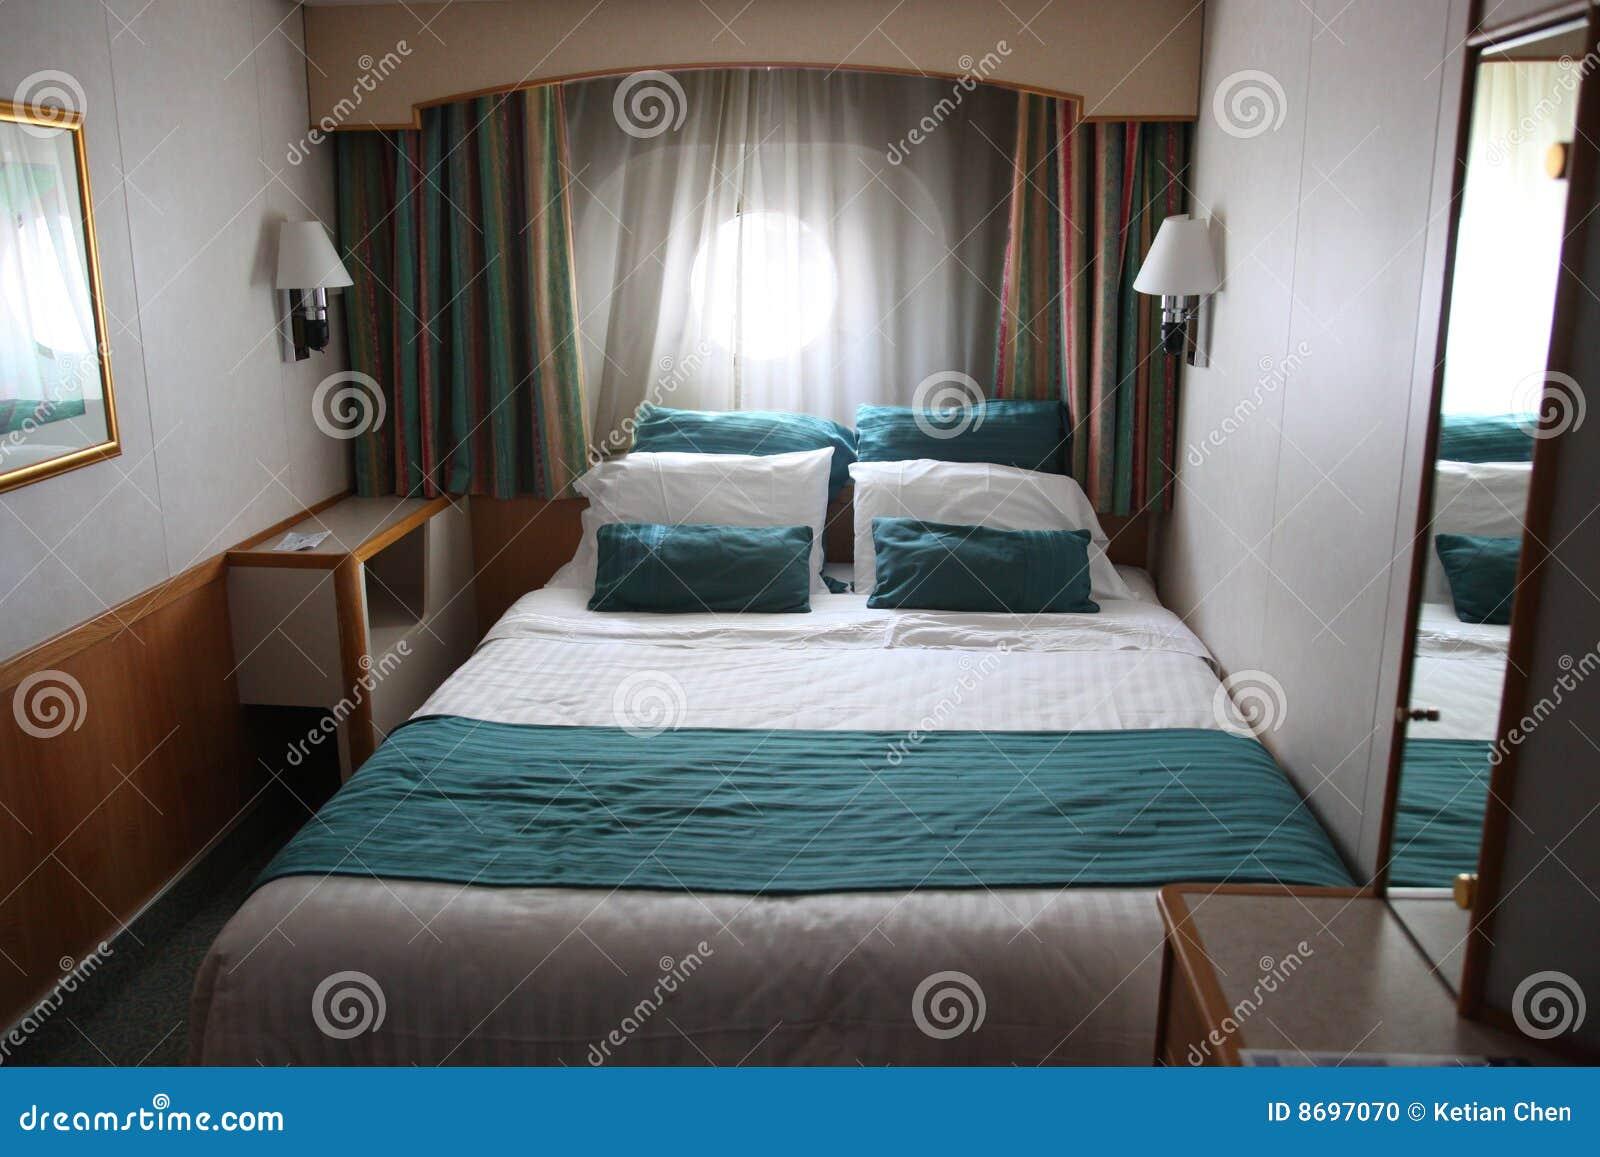 Cabine do navio de cruzeiros foto de stock imagem de for L hotel della cabina islanda